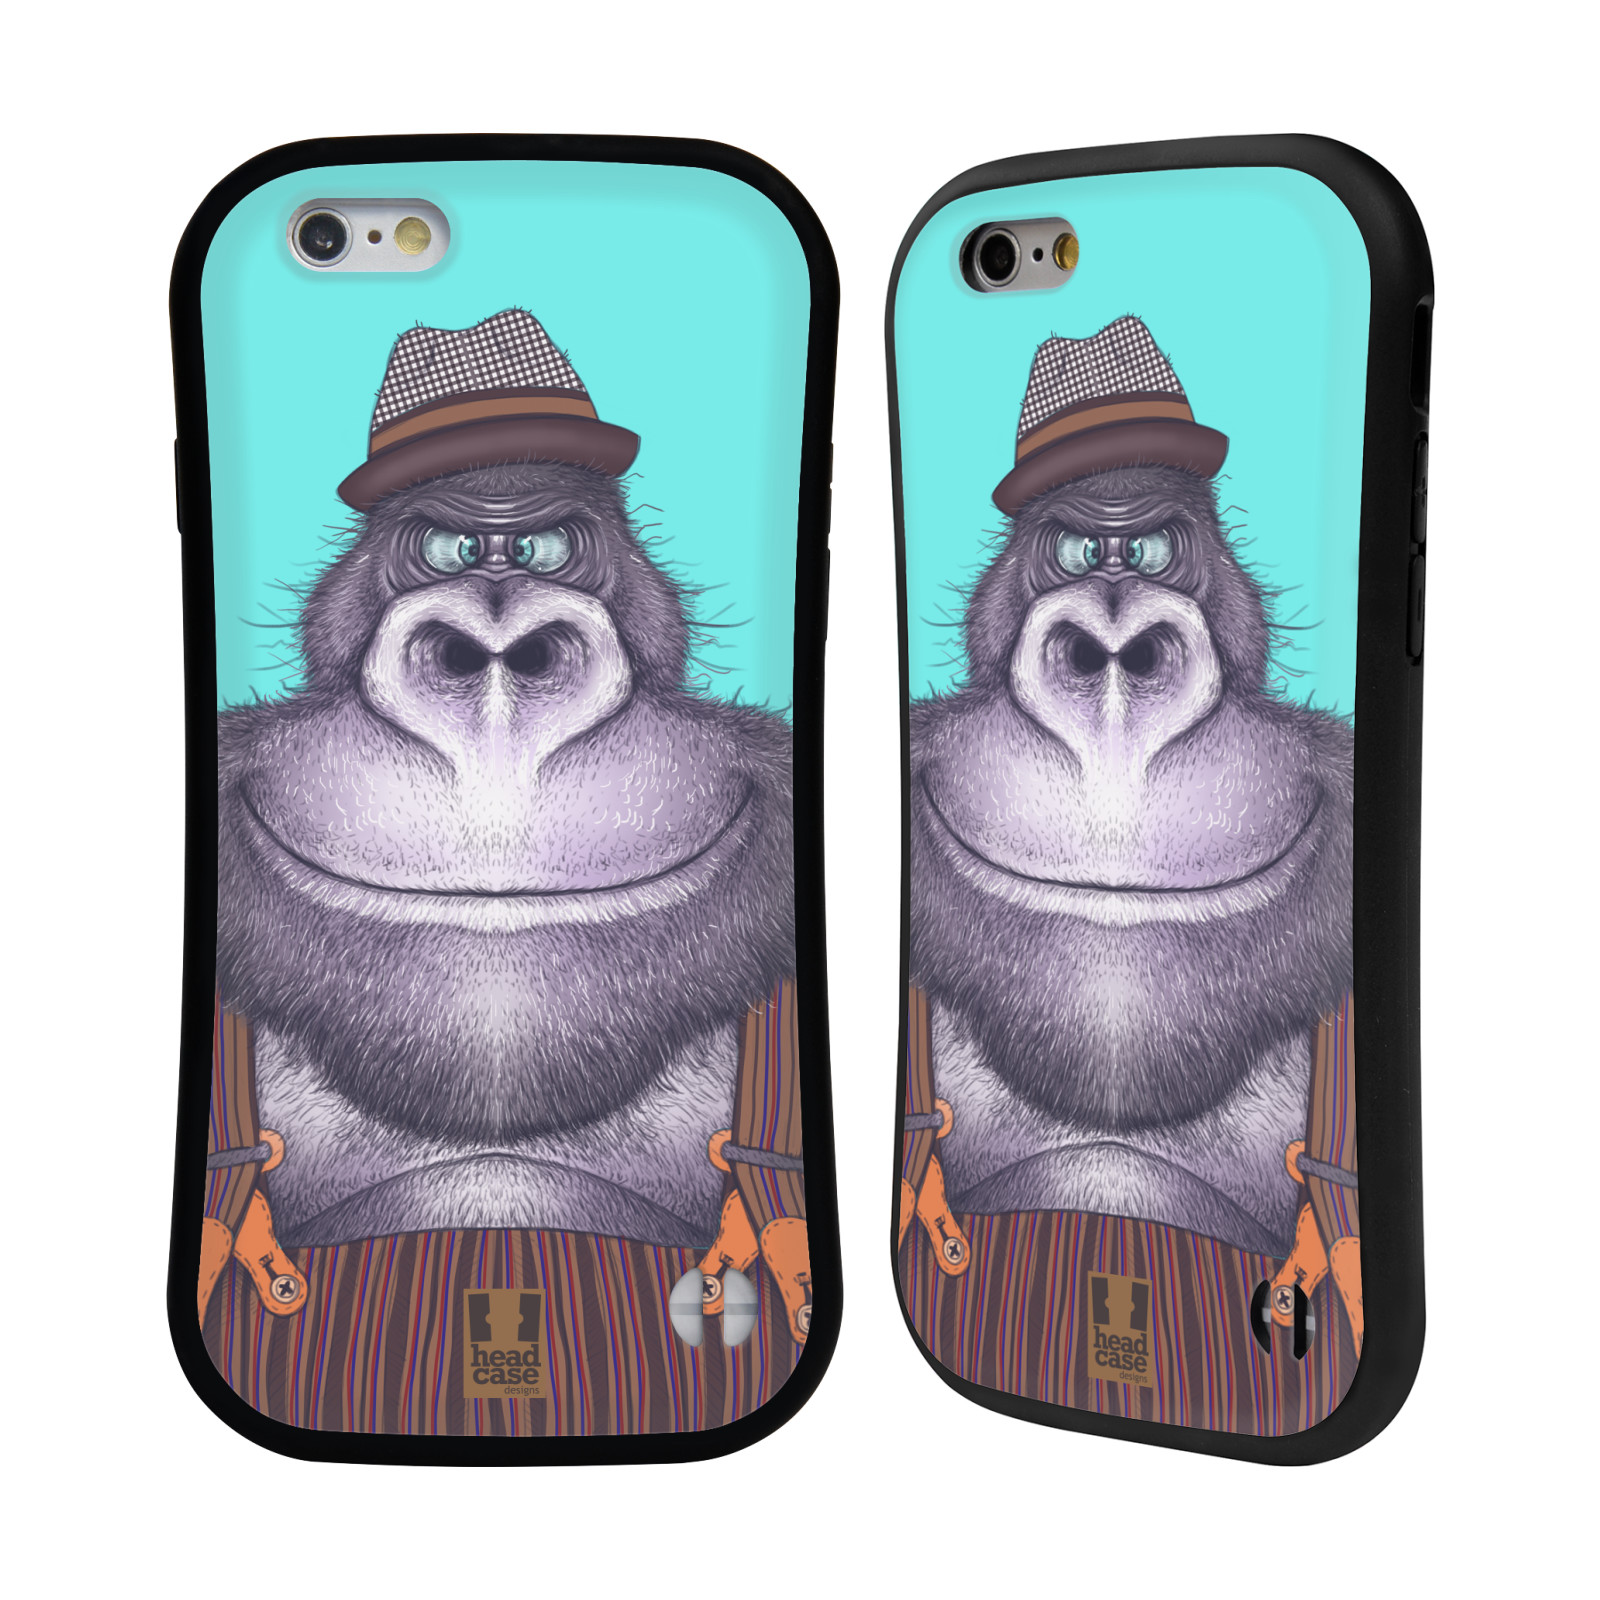 HEAD CASE silikon/plast odolný obal na mobil Apple Iphone 6/6S vzor Kreslená zvířátka gorila